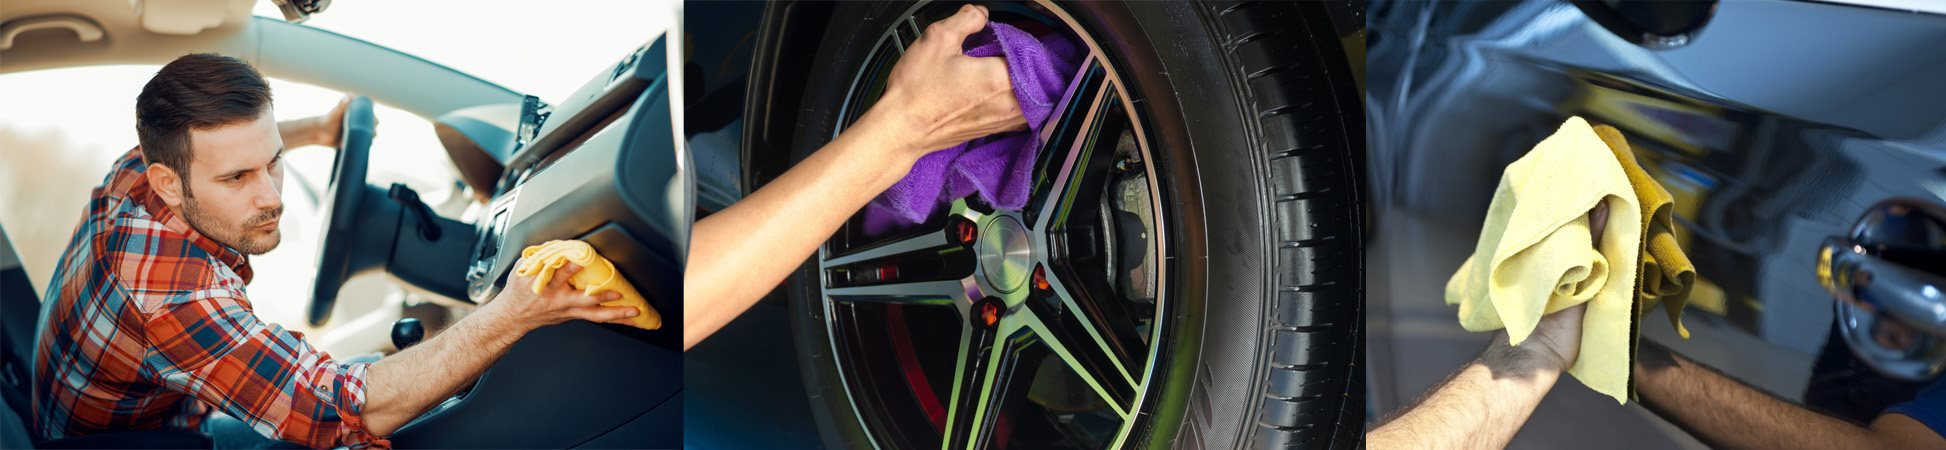 Ako umyť auto po zime